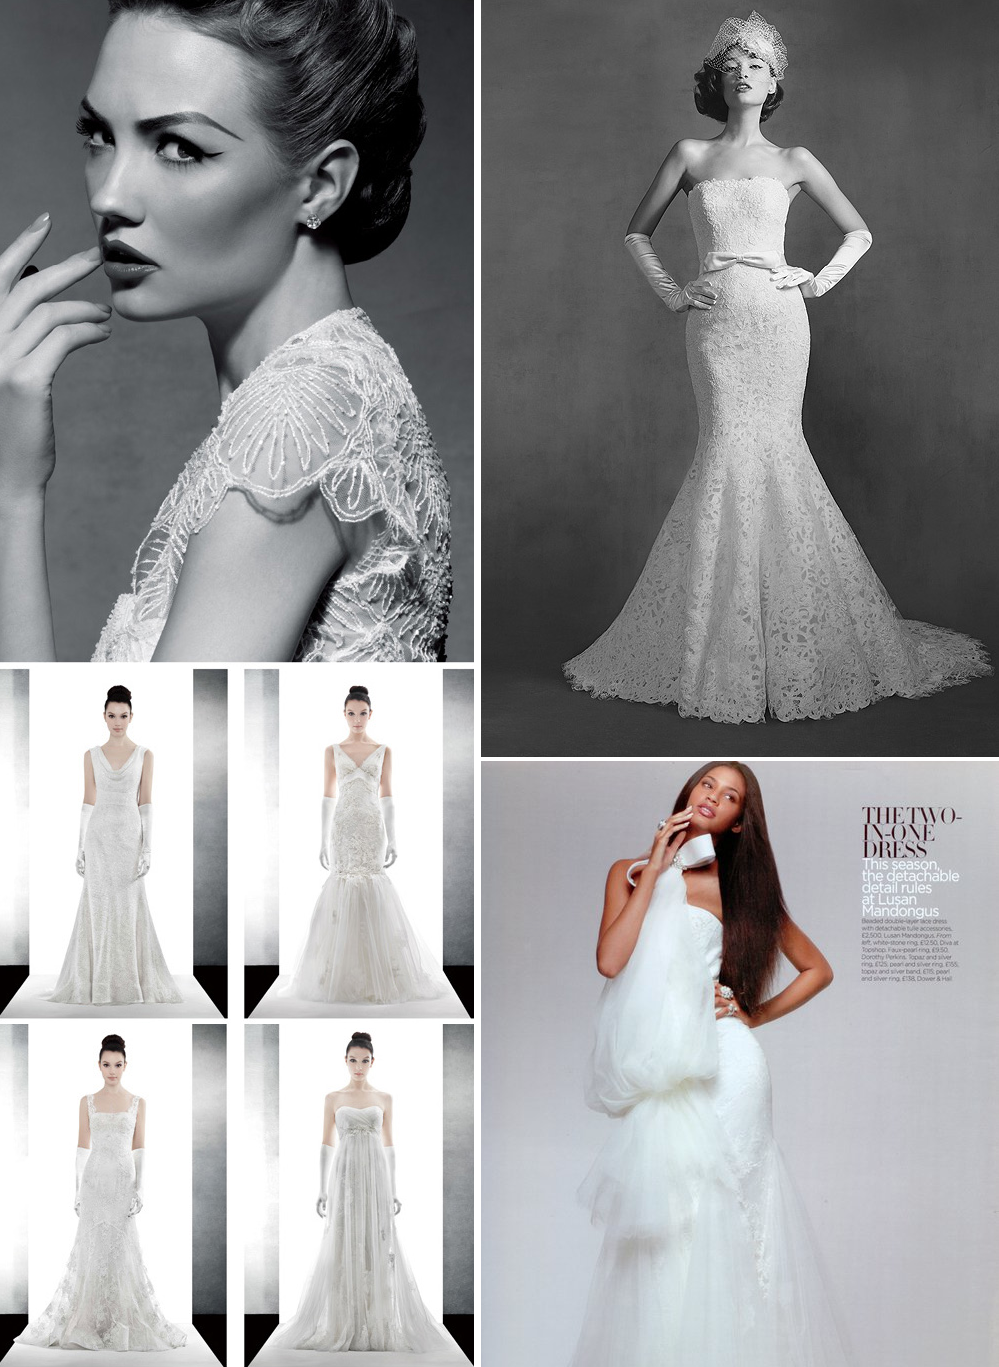 Elegant bridal gowns vintage inspired lace for Vintage inspired wedding dresses lace